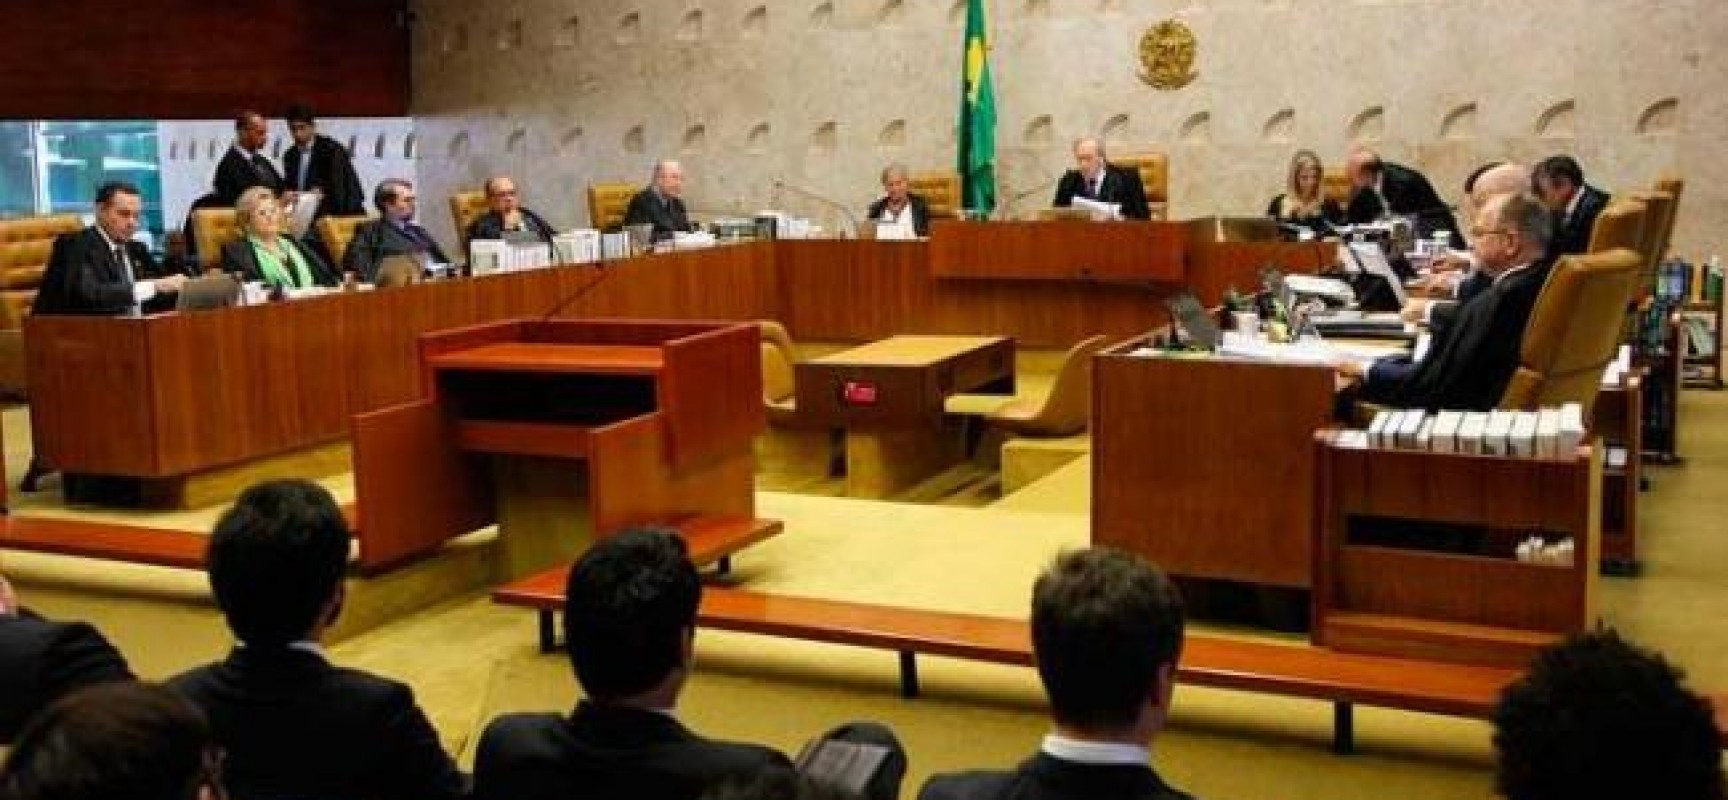 STF: PT indicou 7 dos 11 atuais ministros da Suprema Corte. Confira a ficha completa dos 11 Ministros.